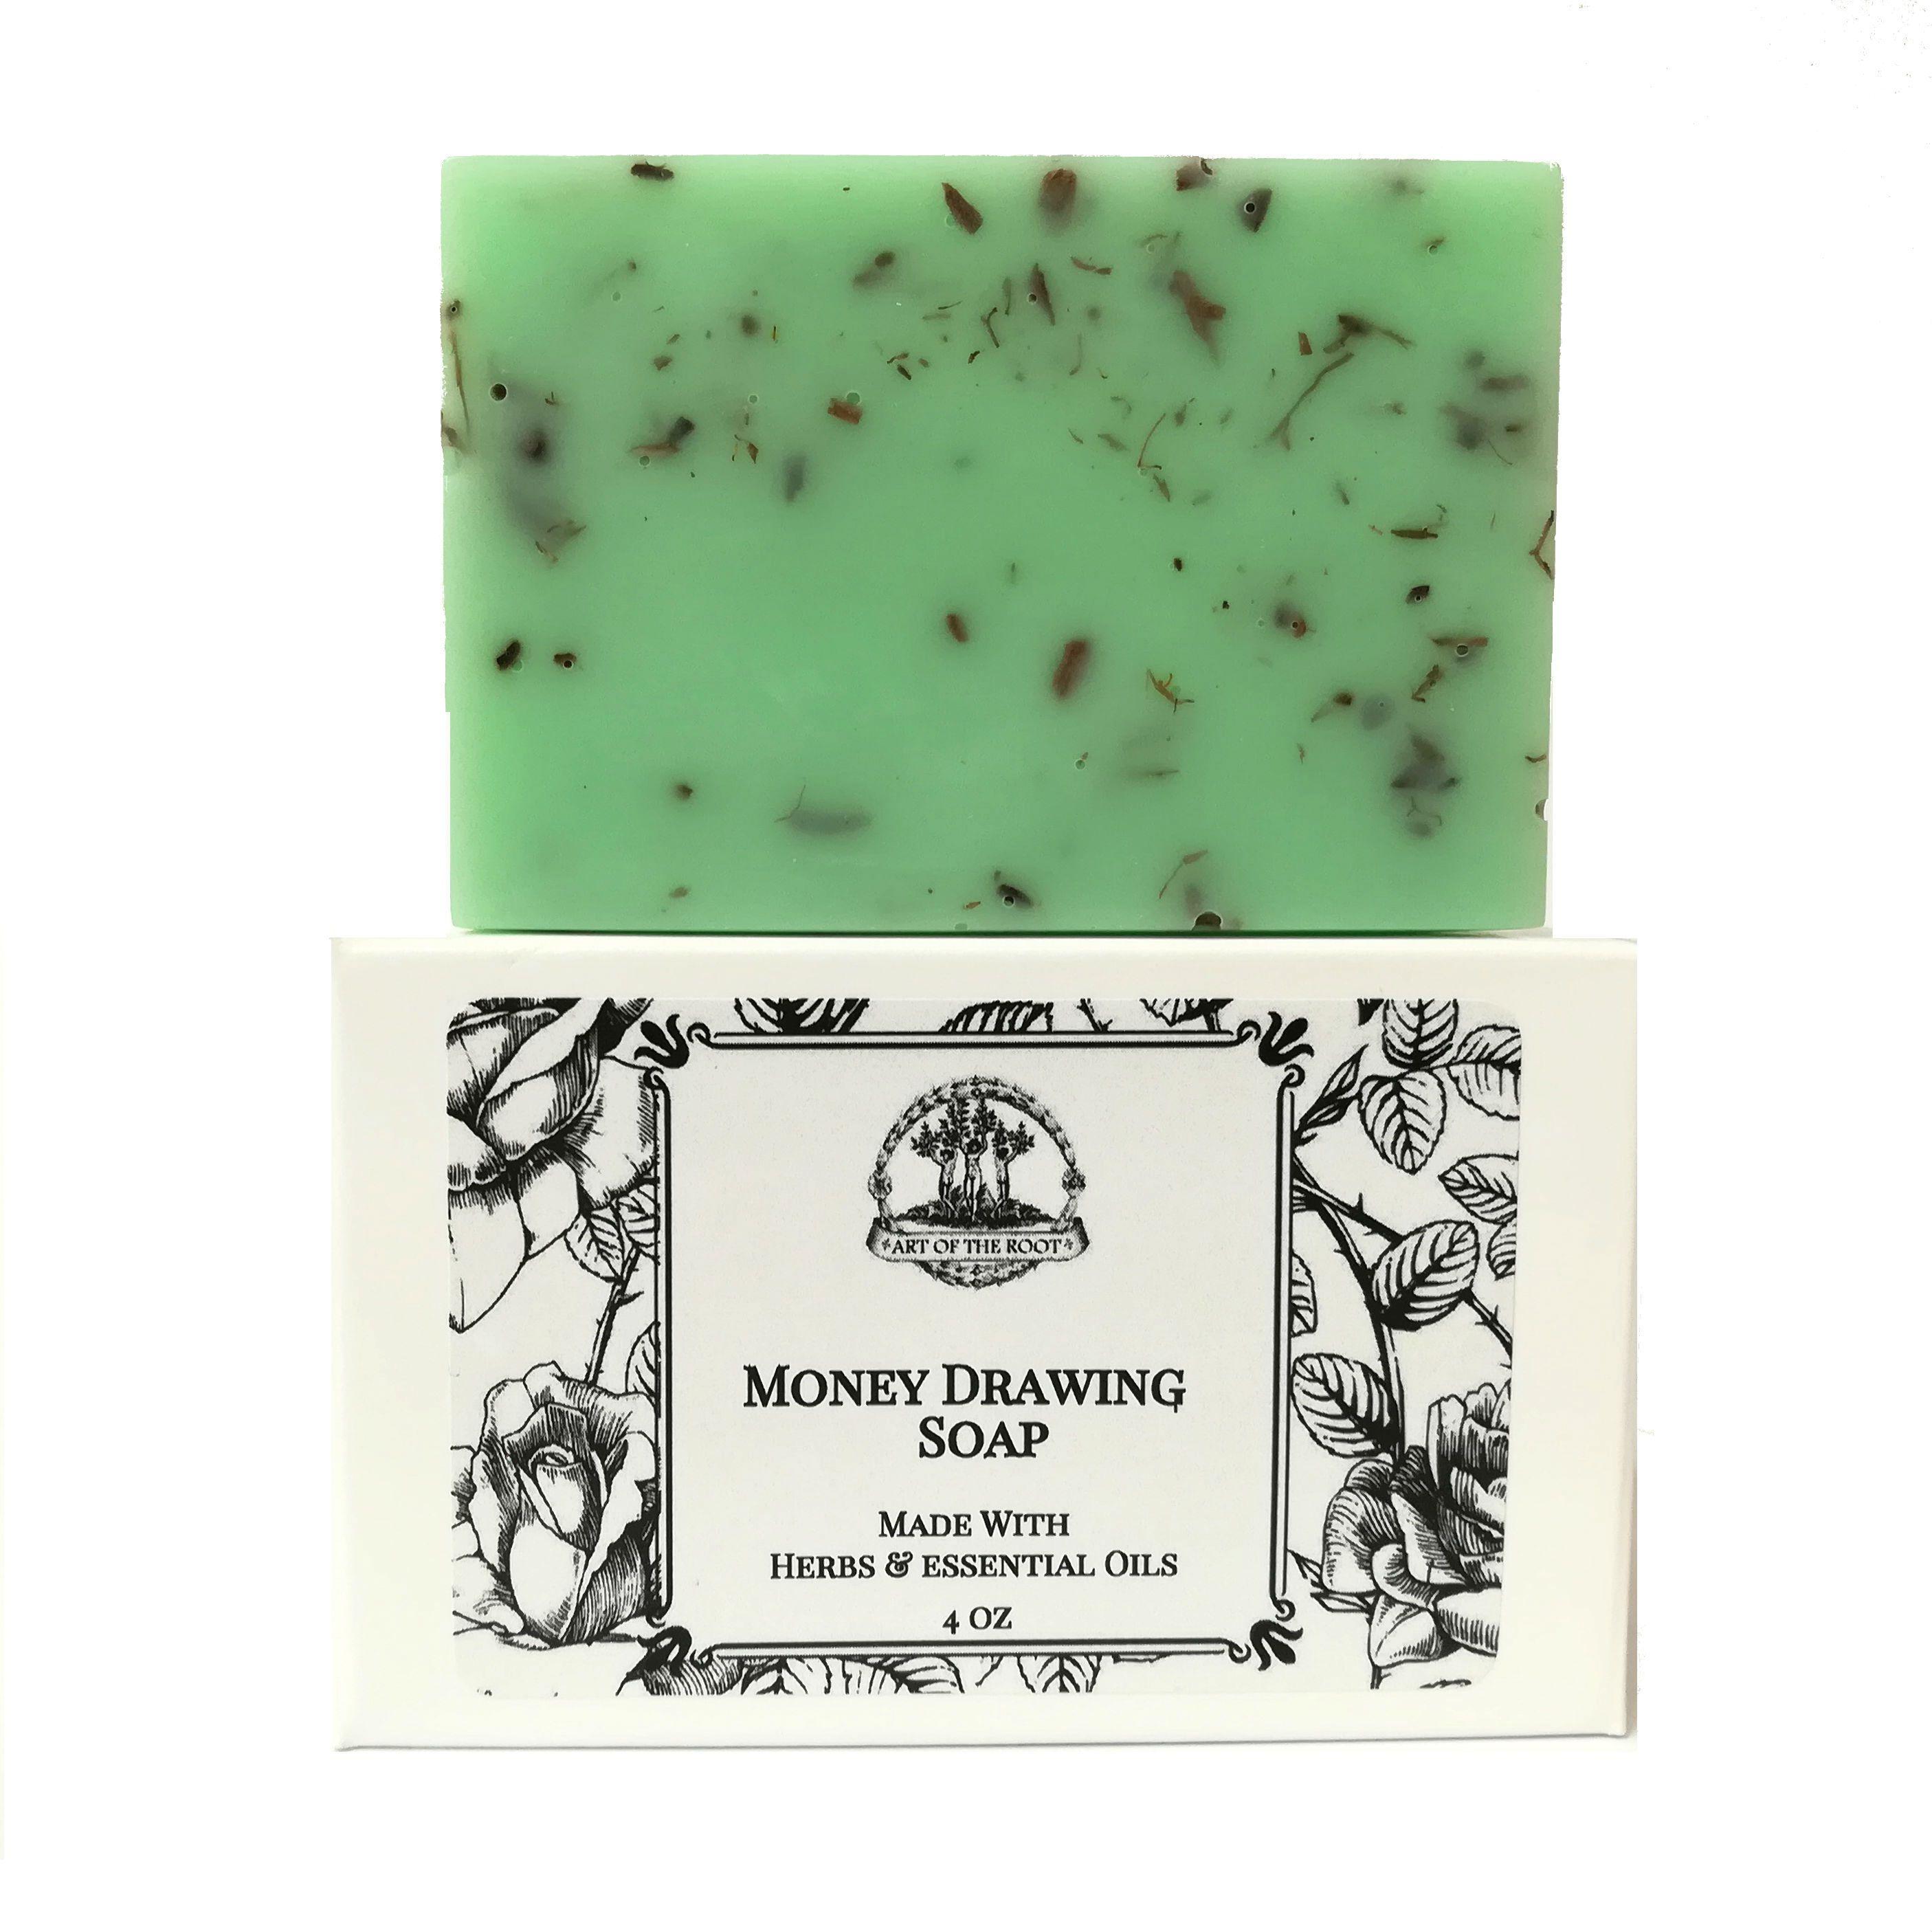 2811x2811 Money Drawing Shea Herbal Soap Bar For Wealth, Prosperity, Cash Amp Bett